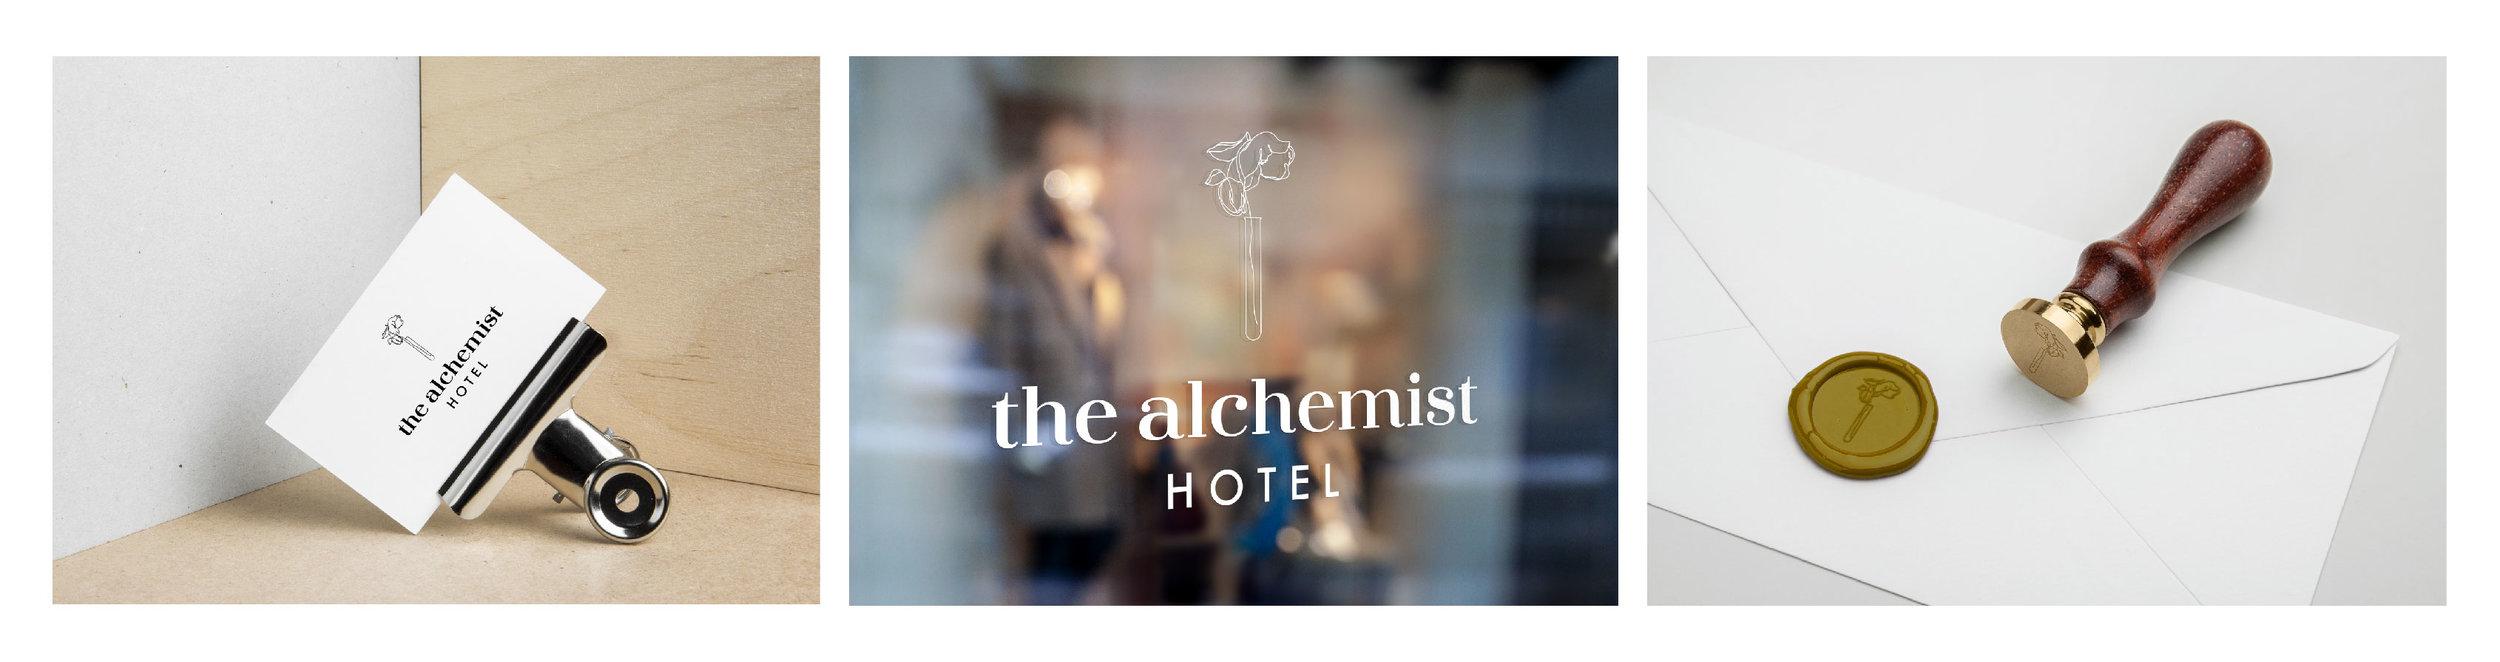 alchemist-zorzi-20.jpg